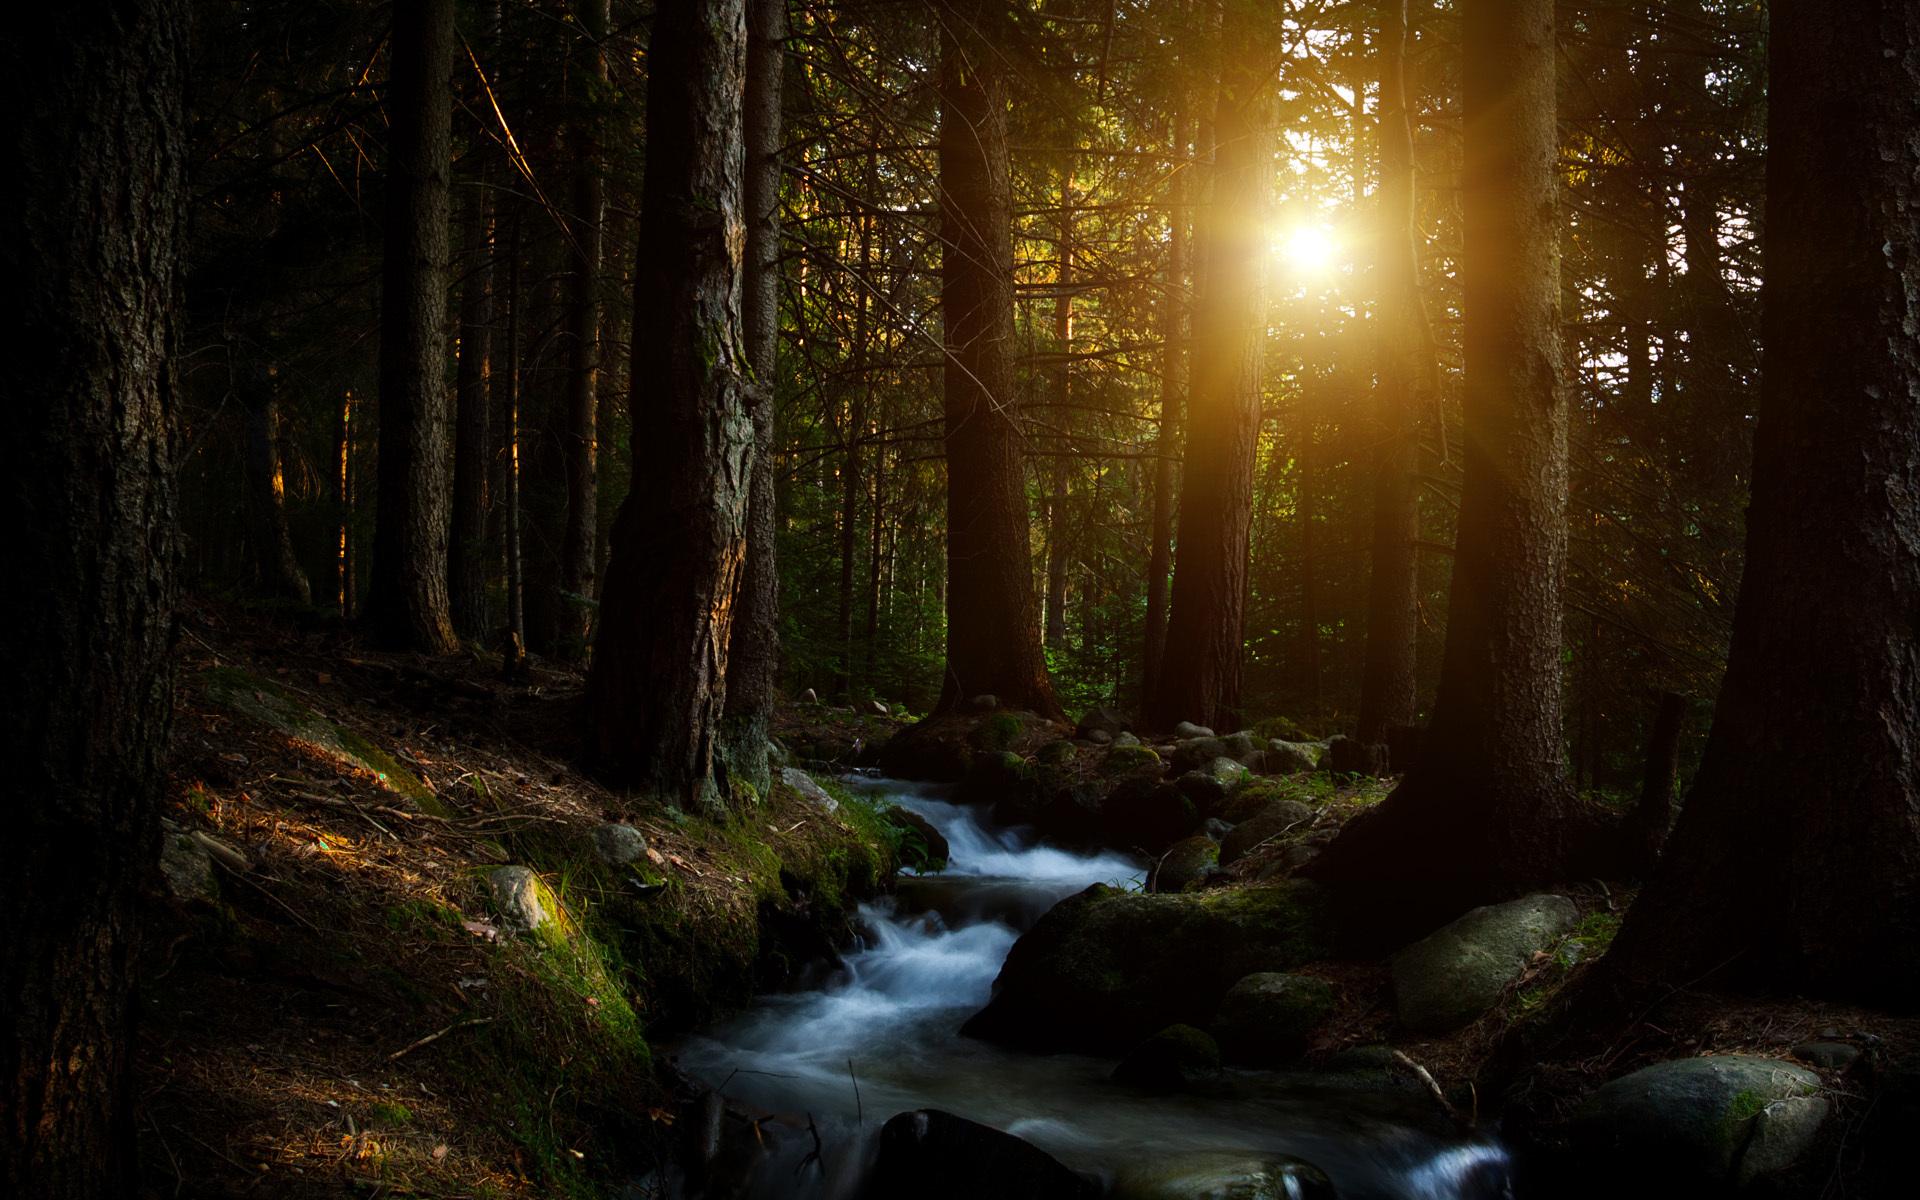 night forest wallpaper sunset